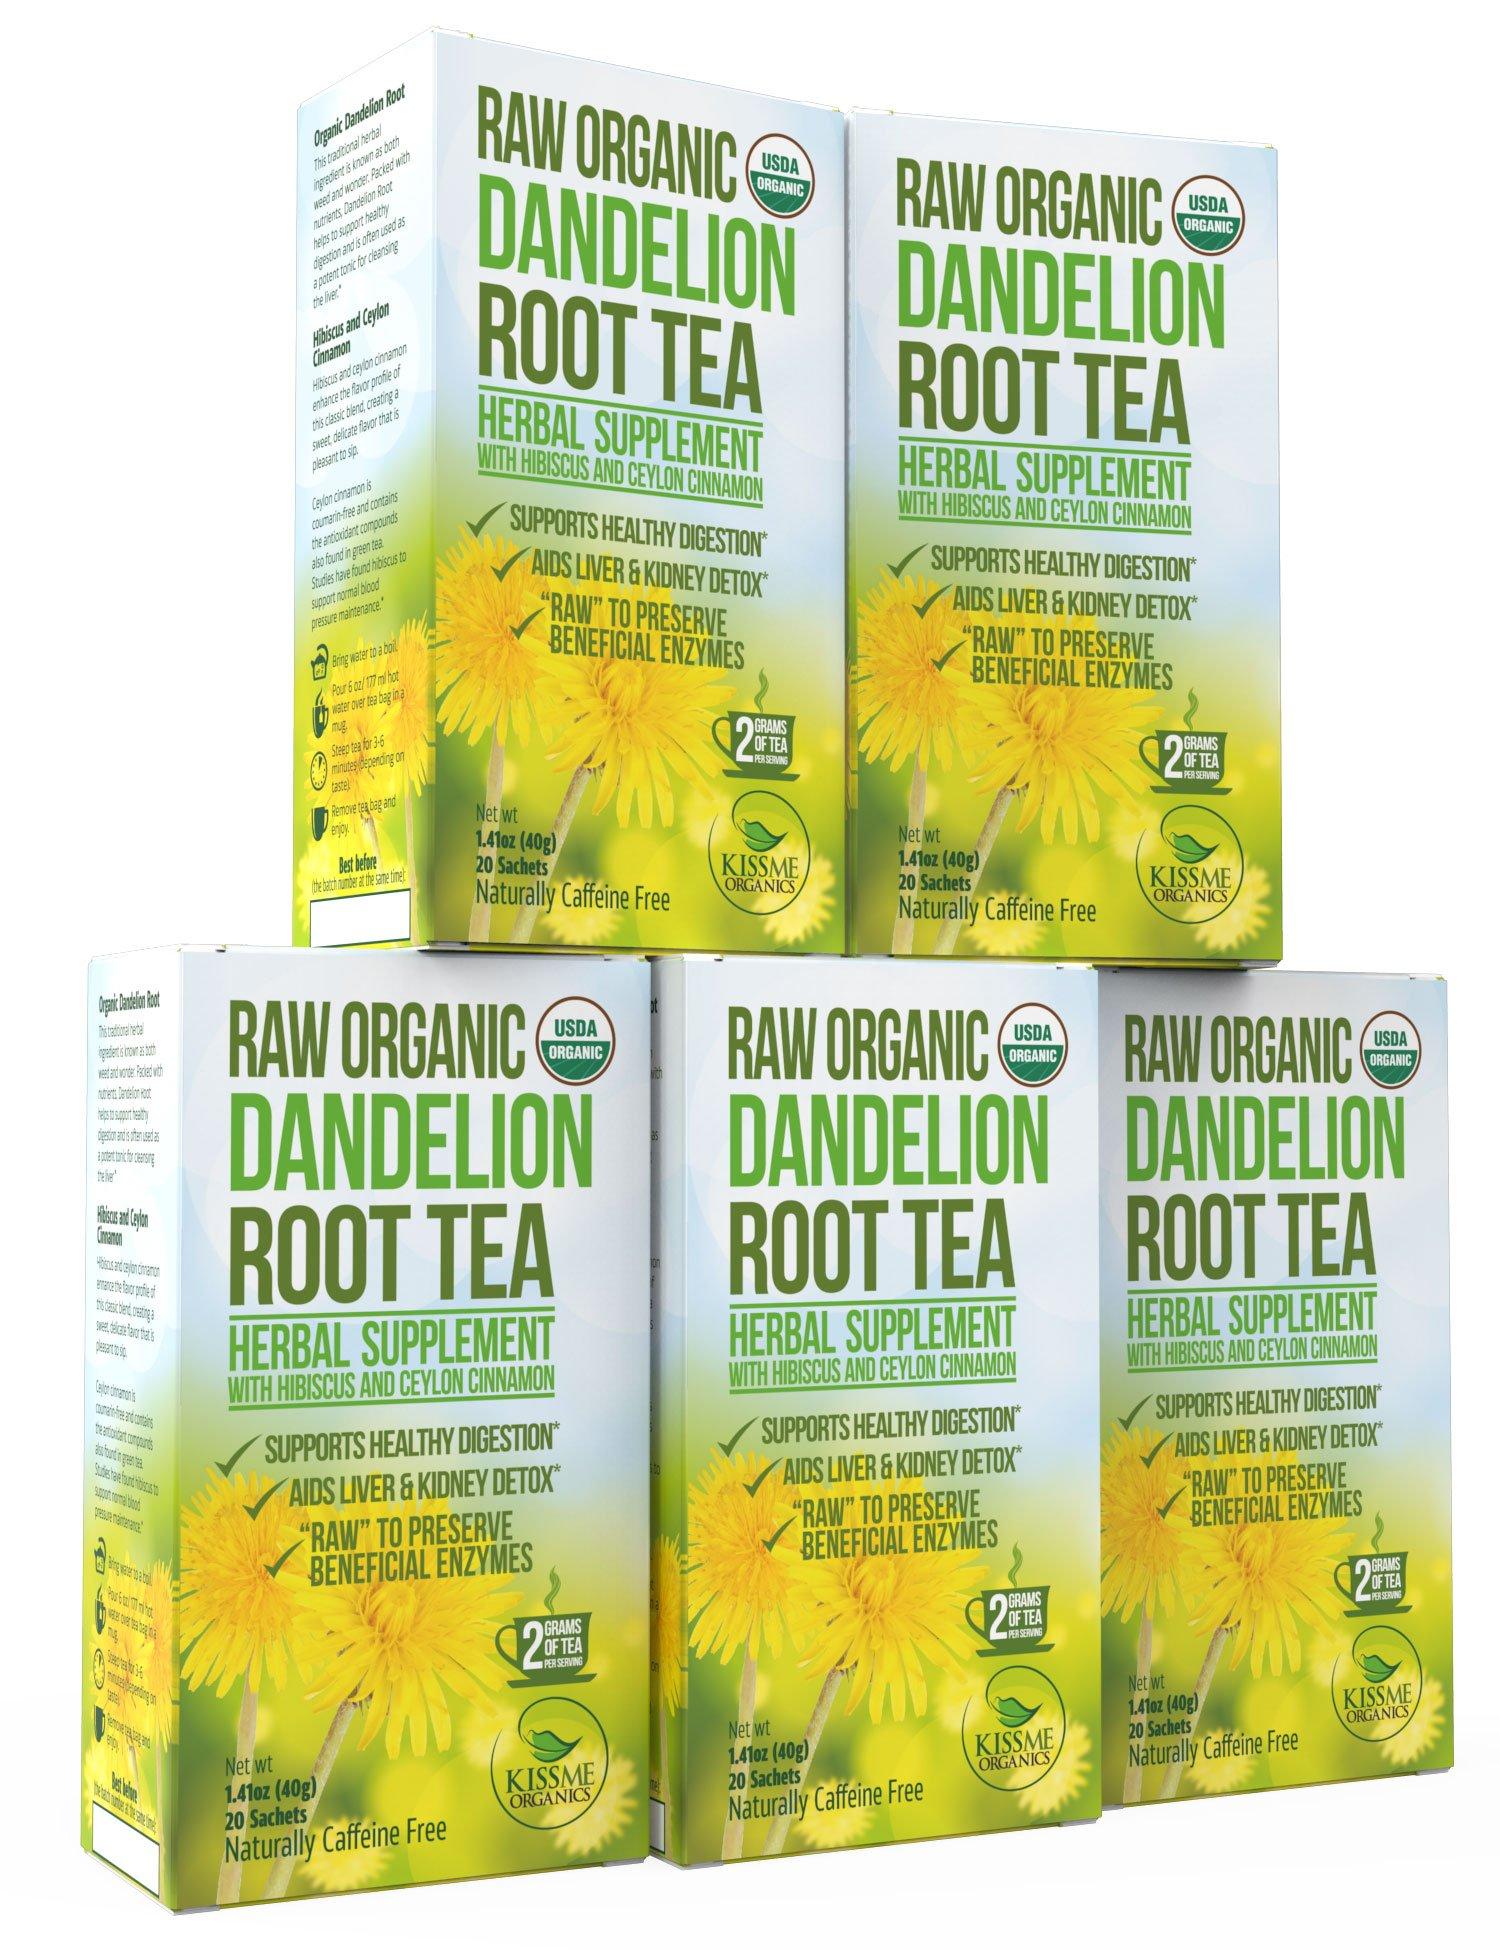 Dandelion Root Tea - Raw Organic Vitamin Rich Digestive - 5 Pack (100 Bags, 2g Each) - Detox Tea - Helps Improve Digestion and Immune System - Anti-inflammatory and Antioxidant - By Kiss Me Organics